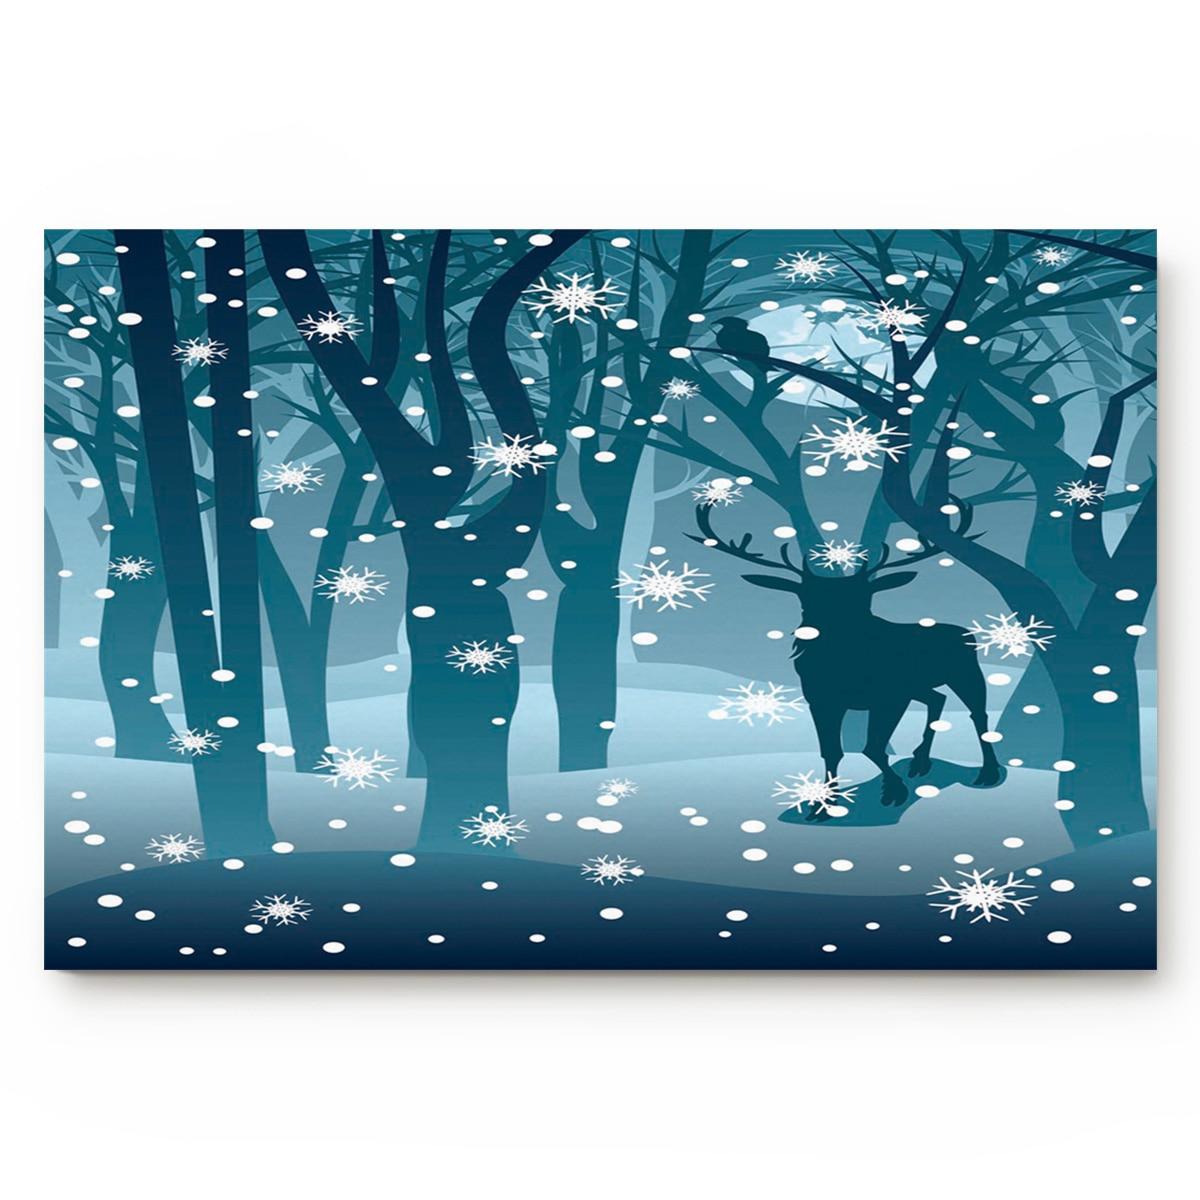 Us 13 06 40 Off Elk Snowflake Forest Silhouette Blue Christmas Bath Rugs Christmas Doormat Non Slip Door Mat Carpet Bathroom Accessories In Mat From